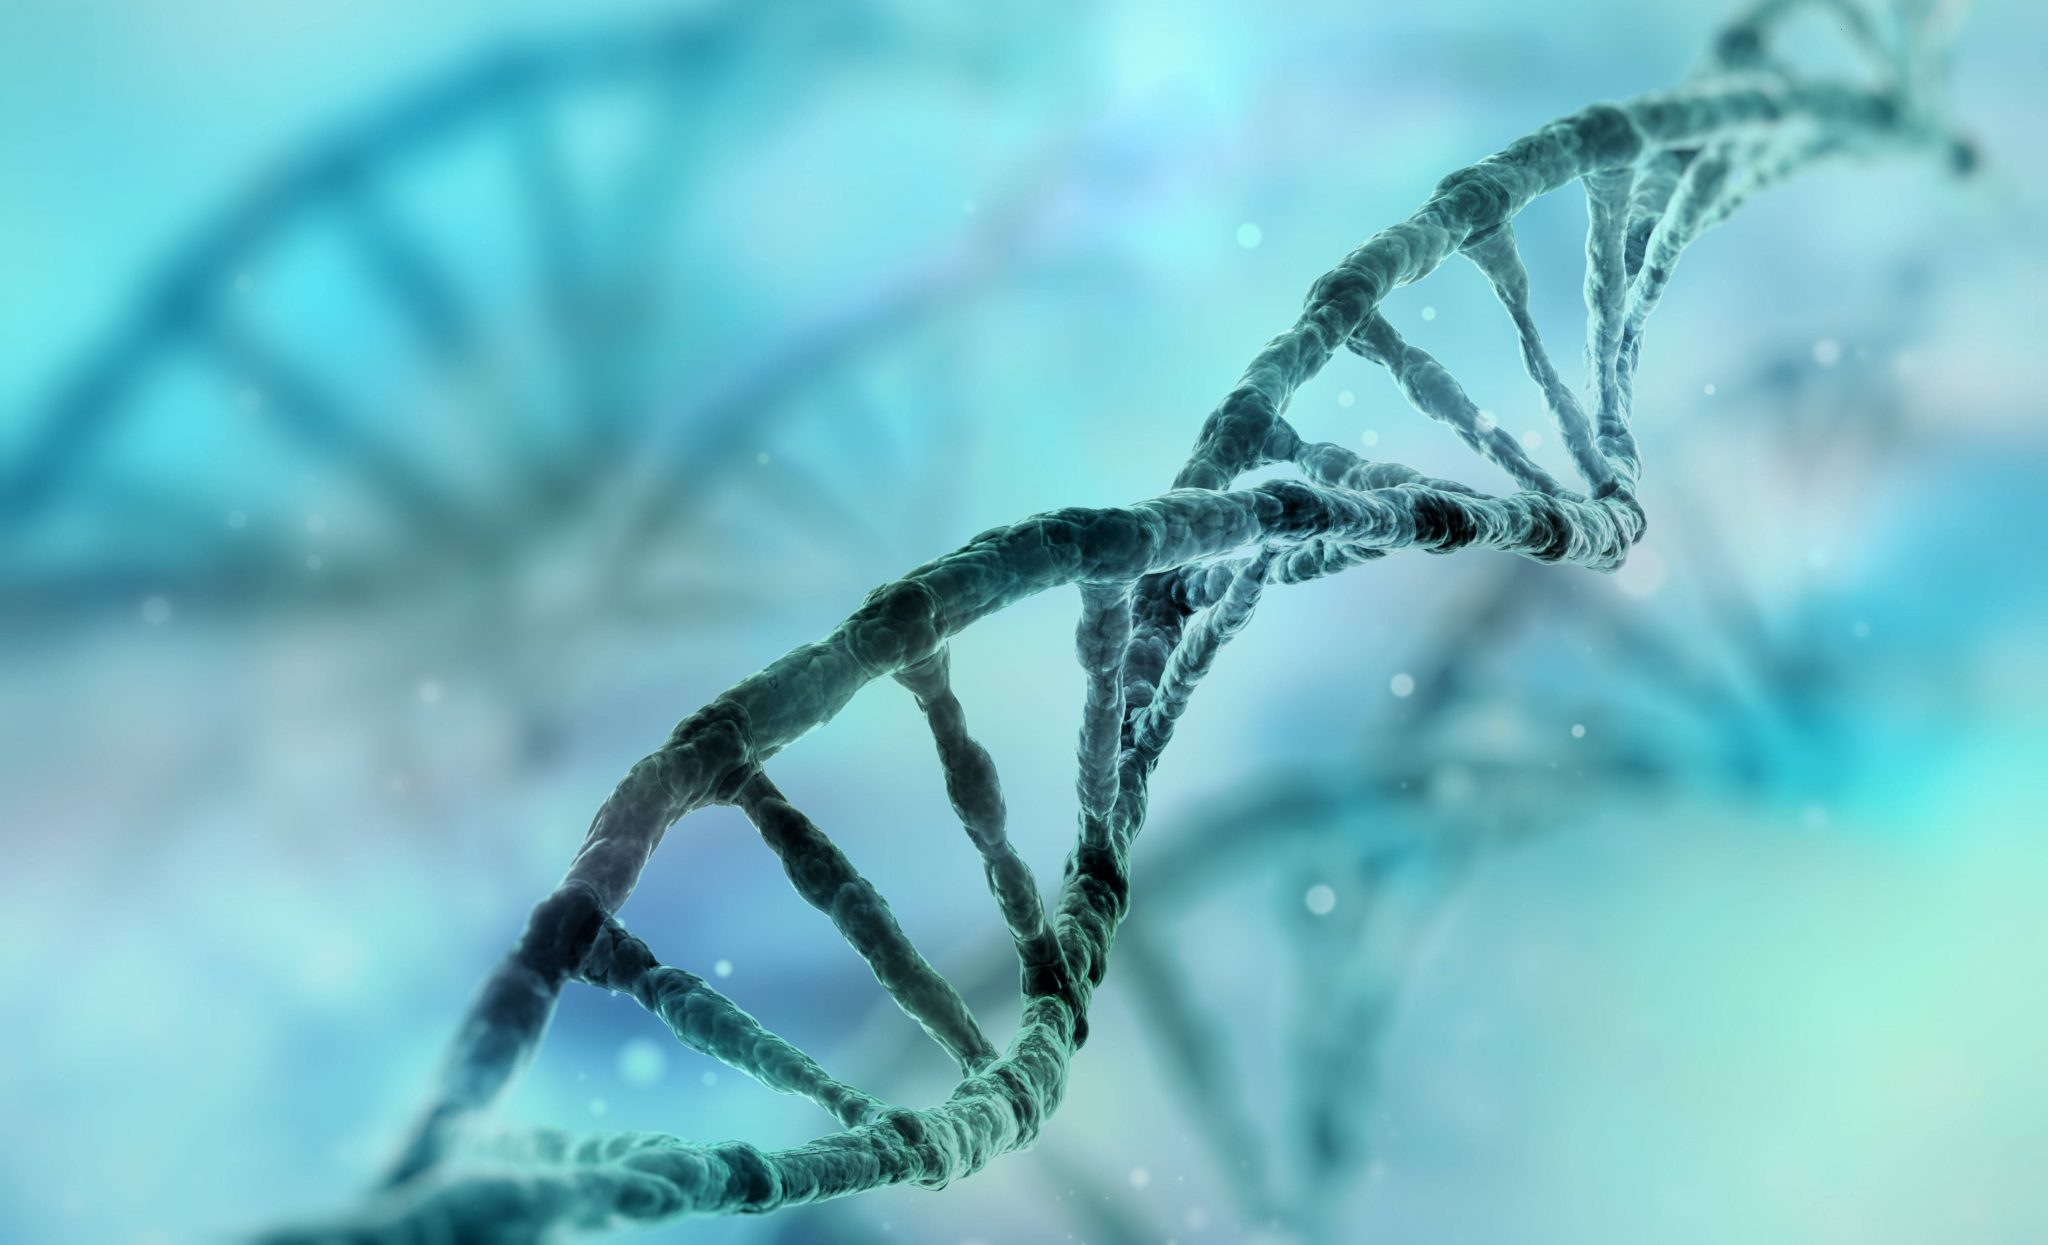 DNA2-illustrated-2-2048x1245.jpg